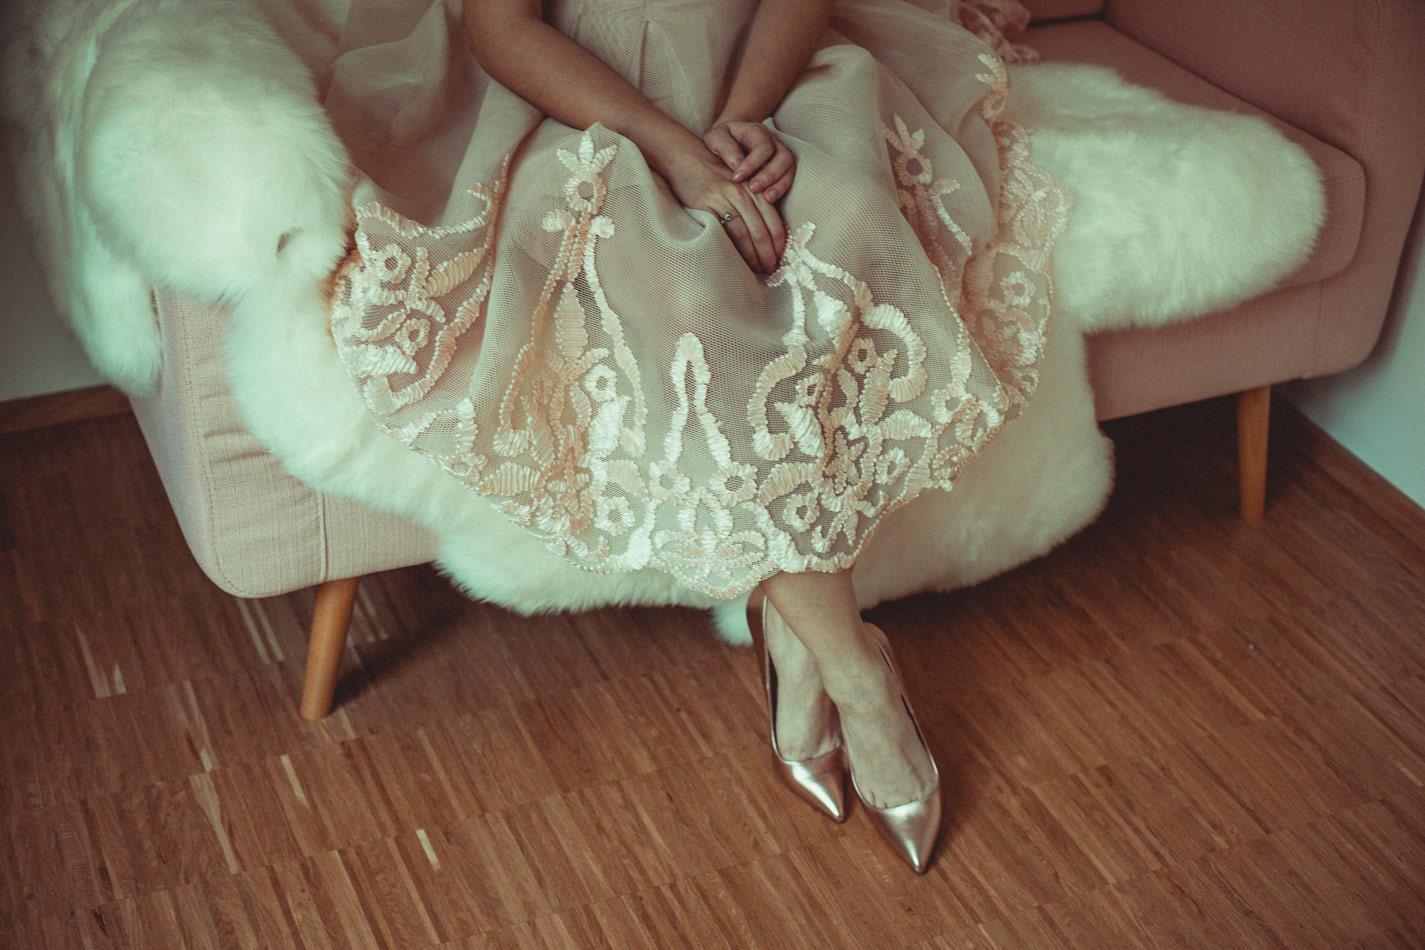 Asos-Rosa-Kleid-Bonbonkleid-Deichmann-Silvie-Meiss-Heels-Rosegold-(5)